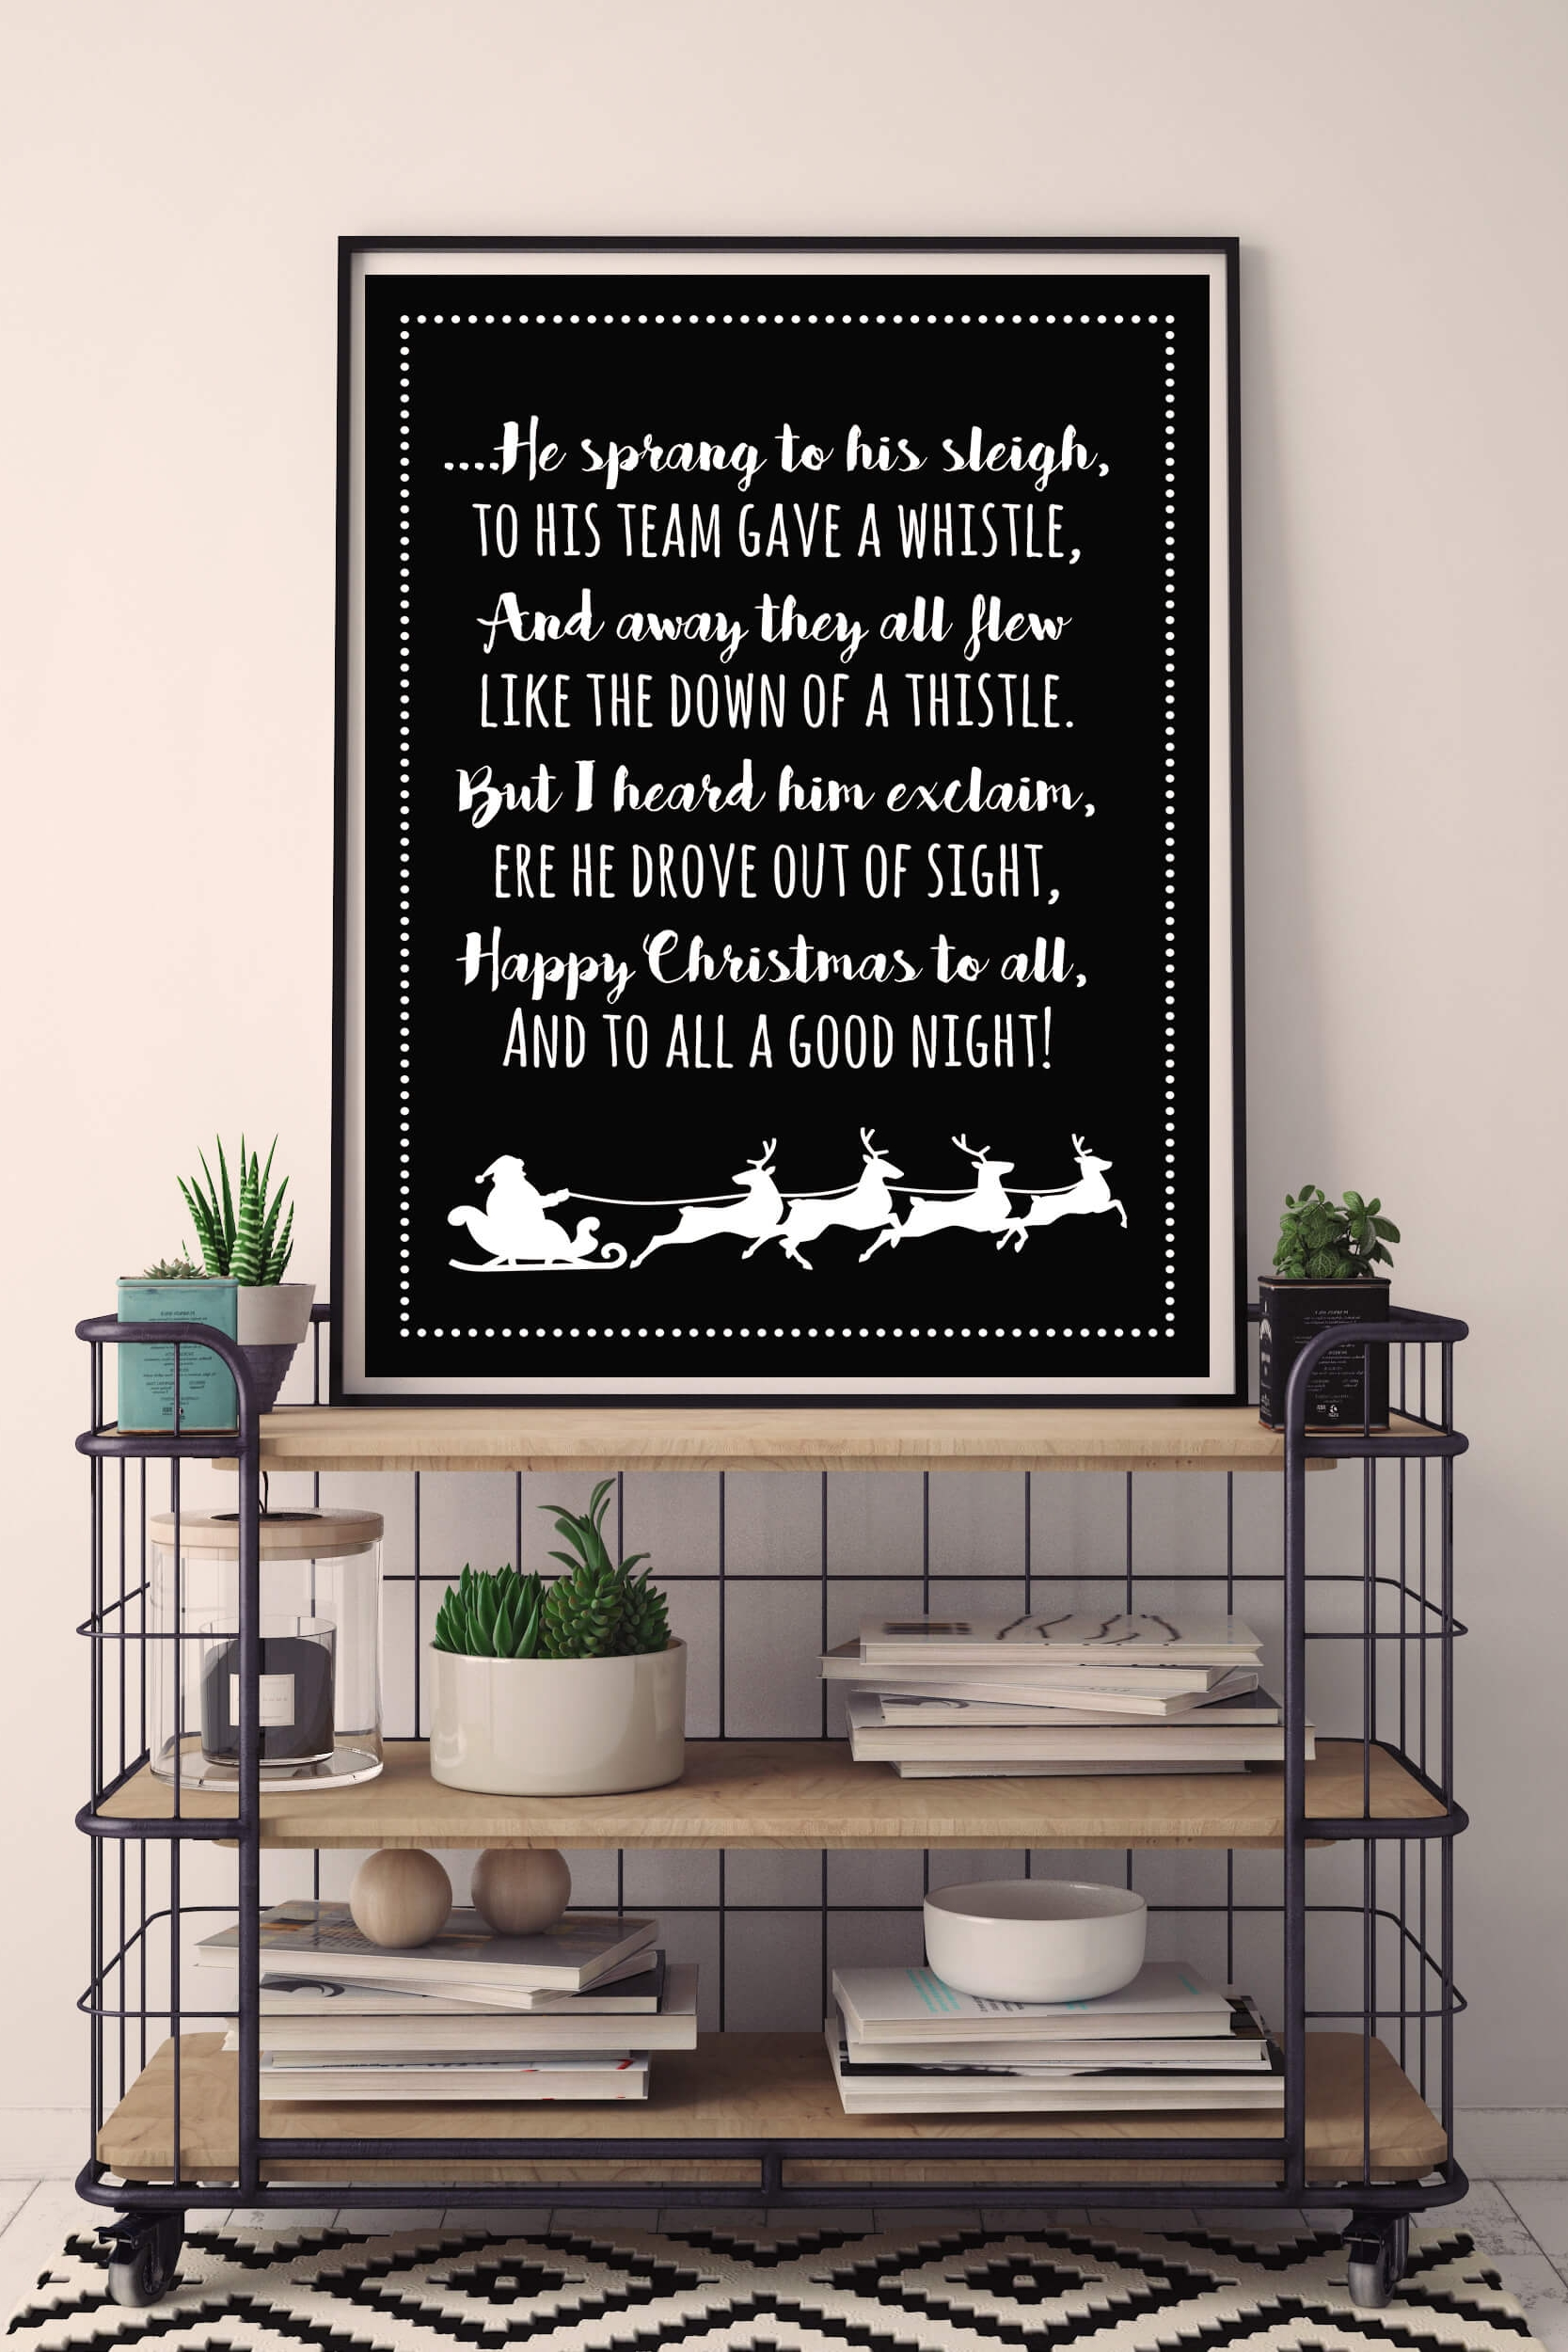 mock up frame bakkerskar met kerstposter.jpg